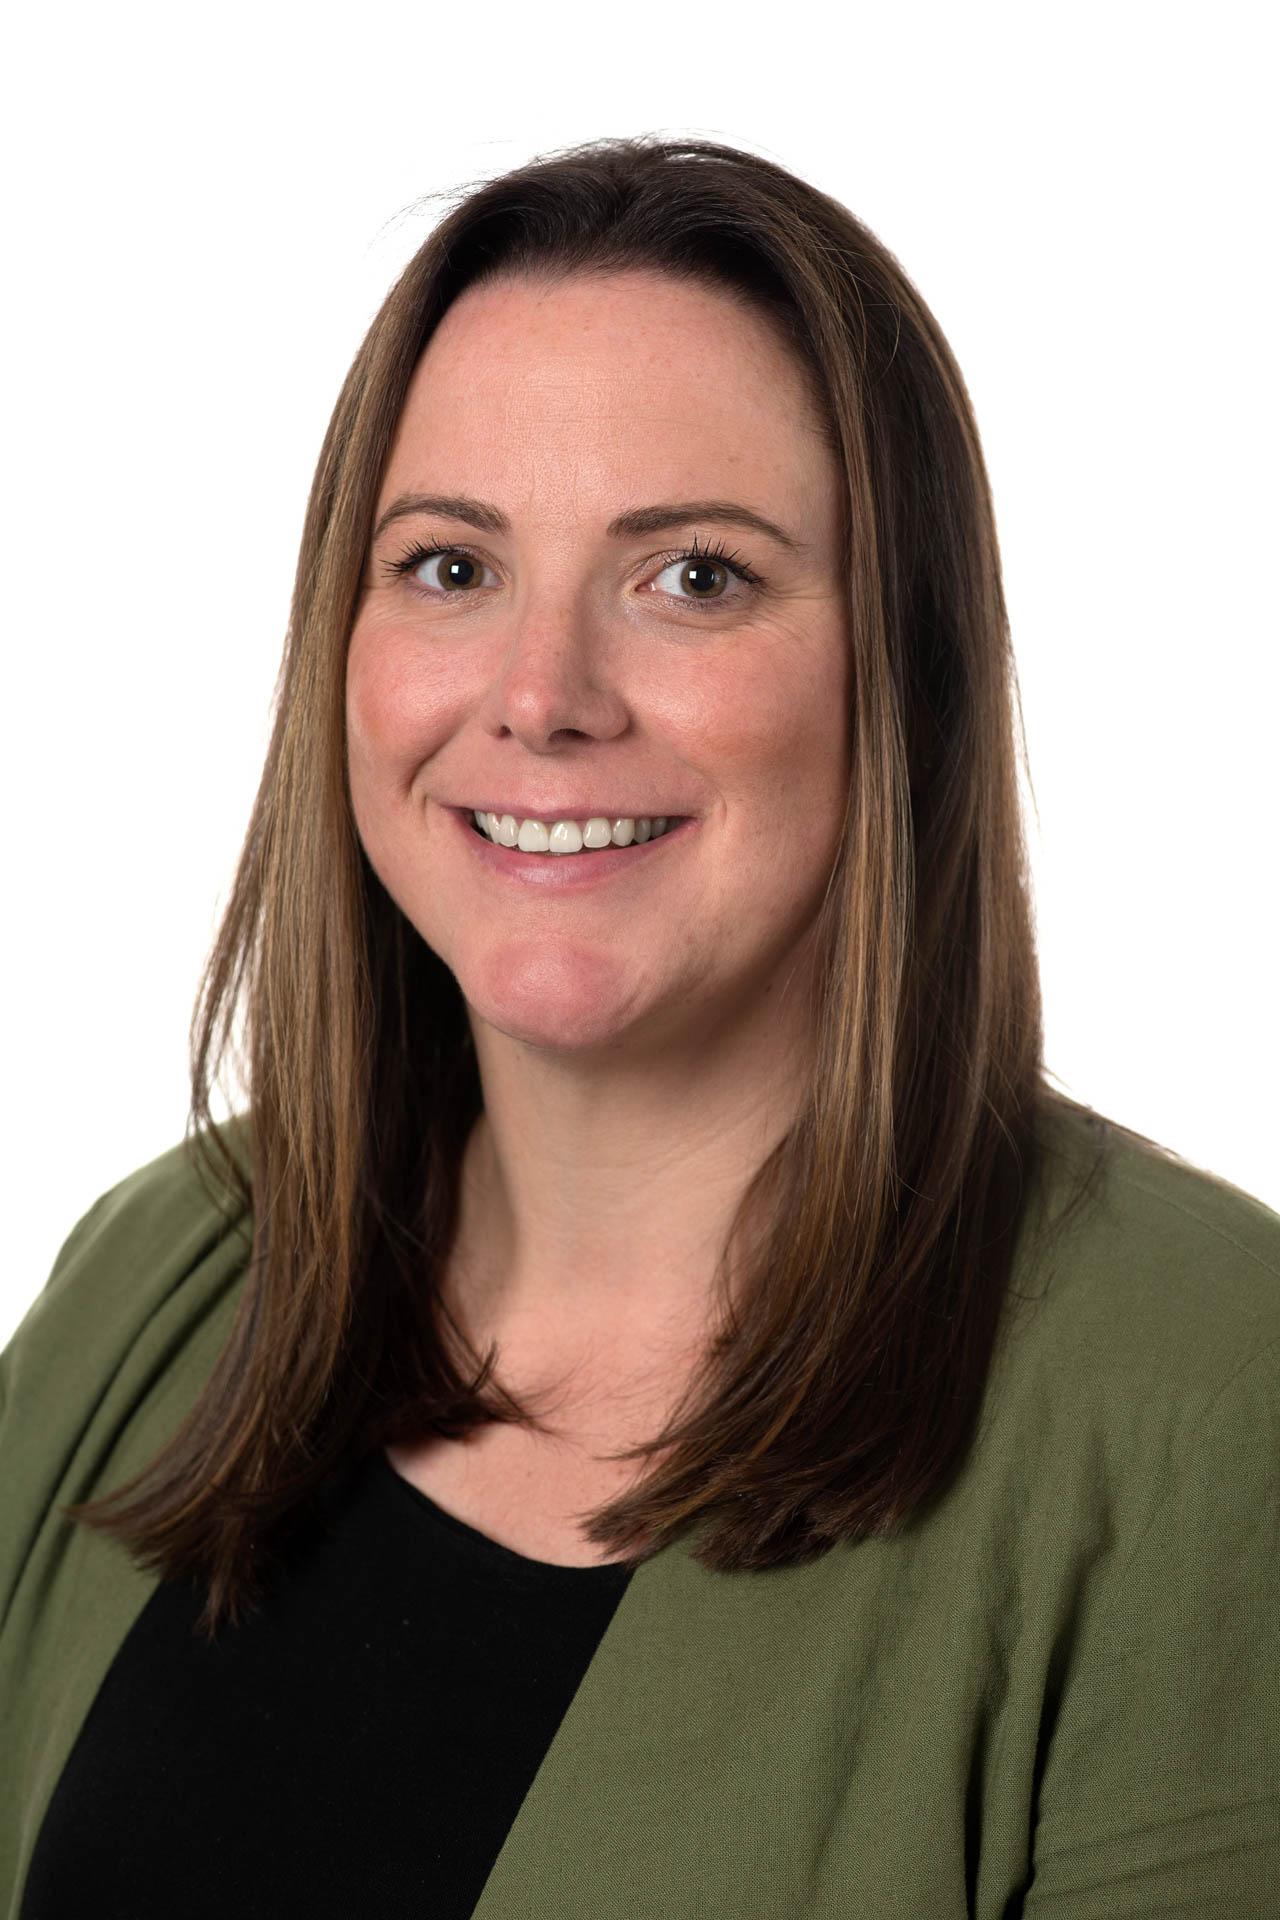 Kate McHardy